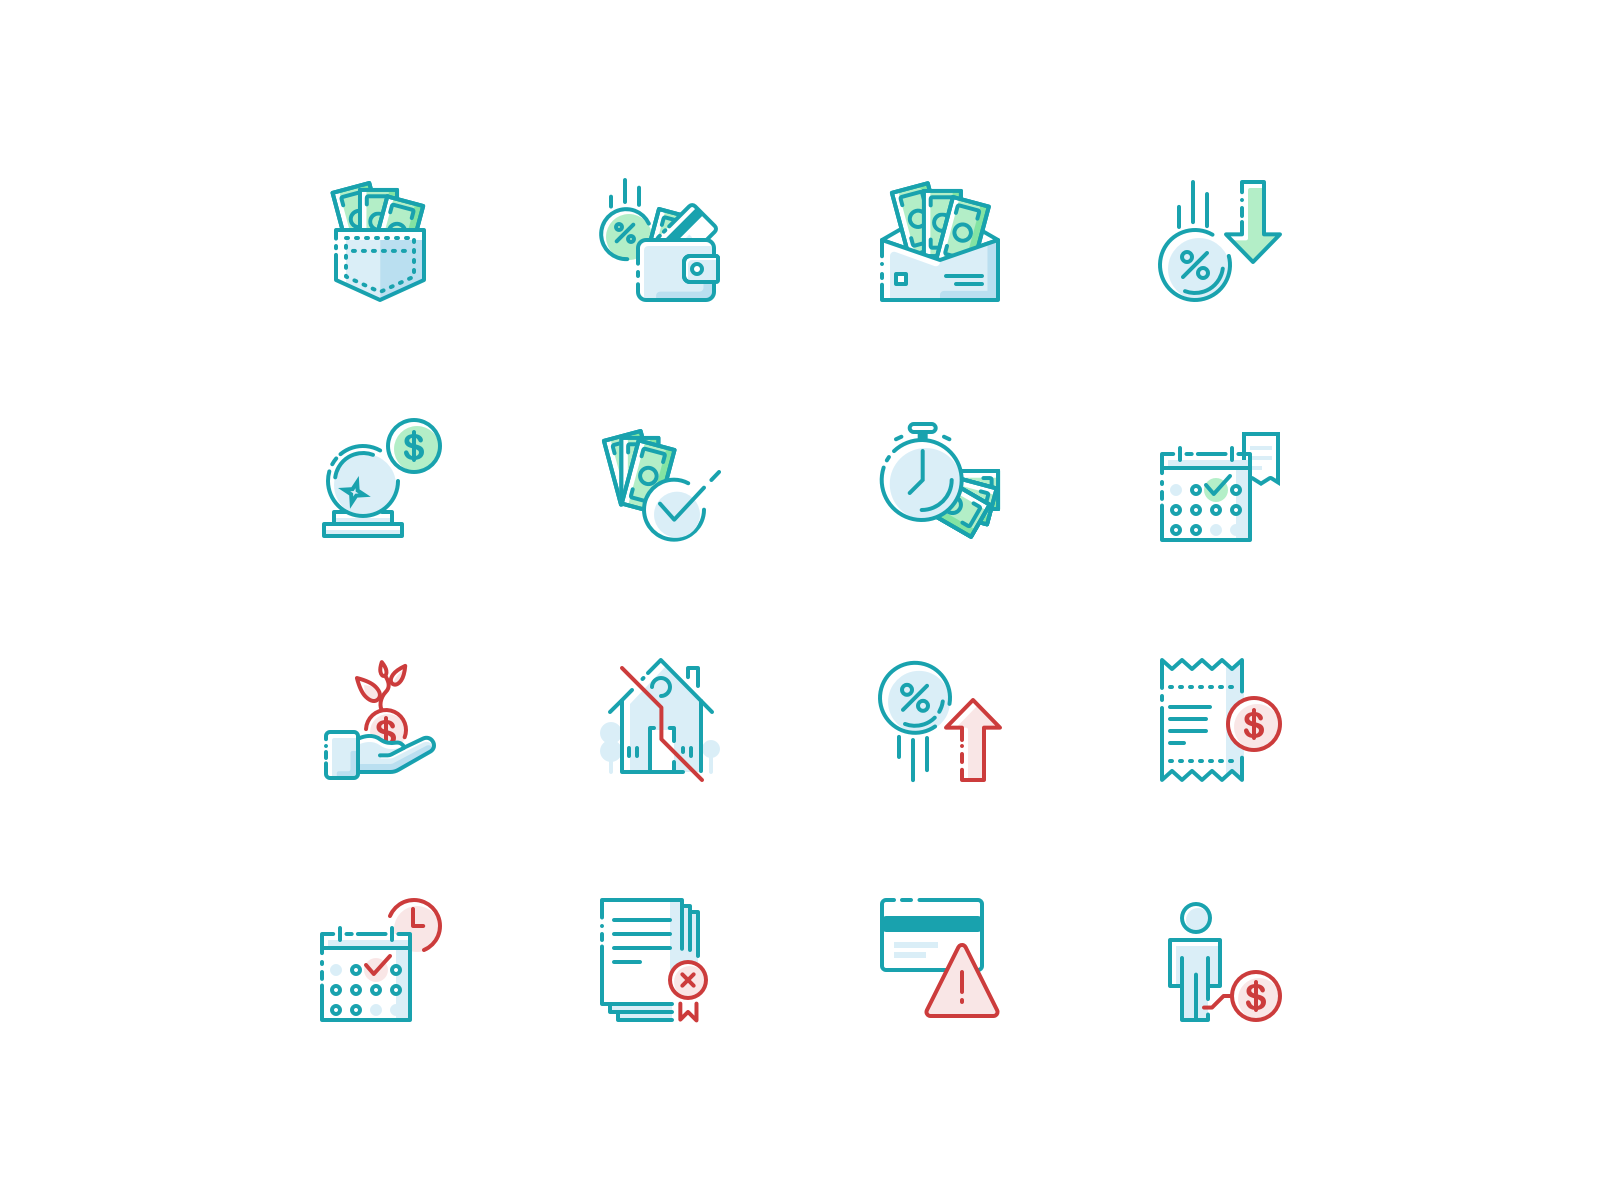 AARP Icon Illustrations